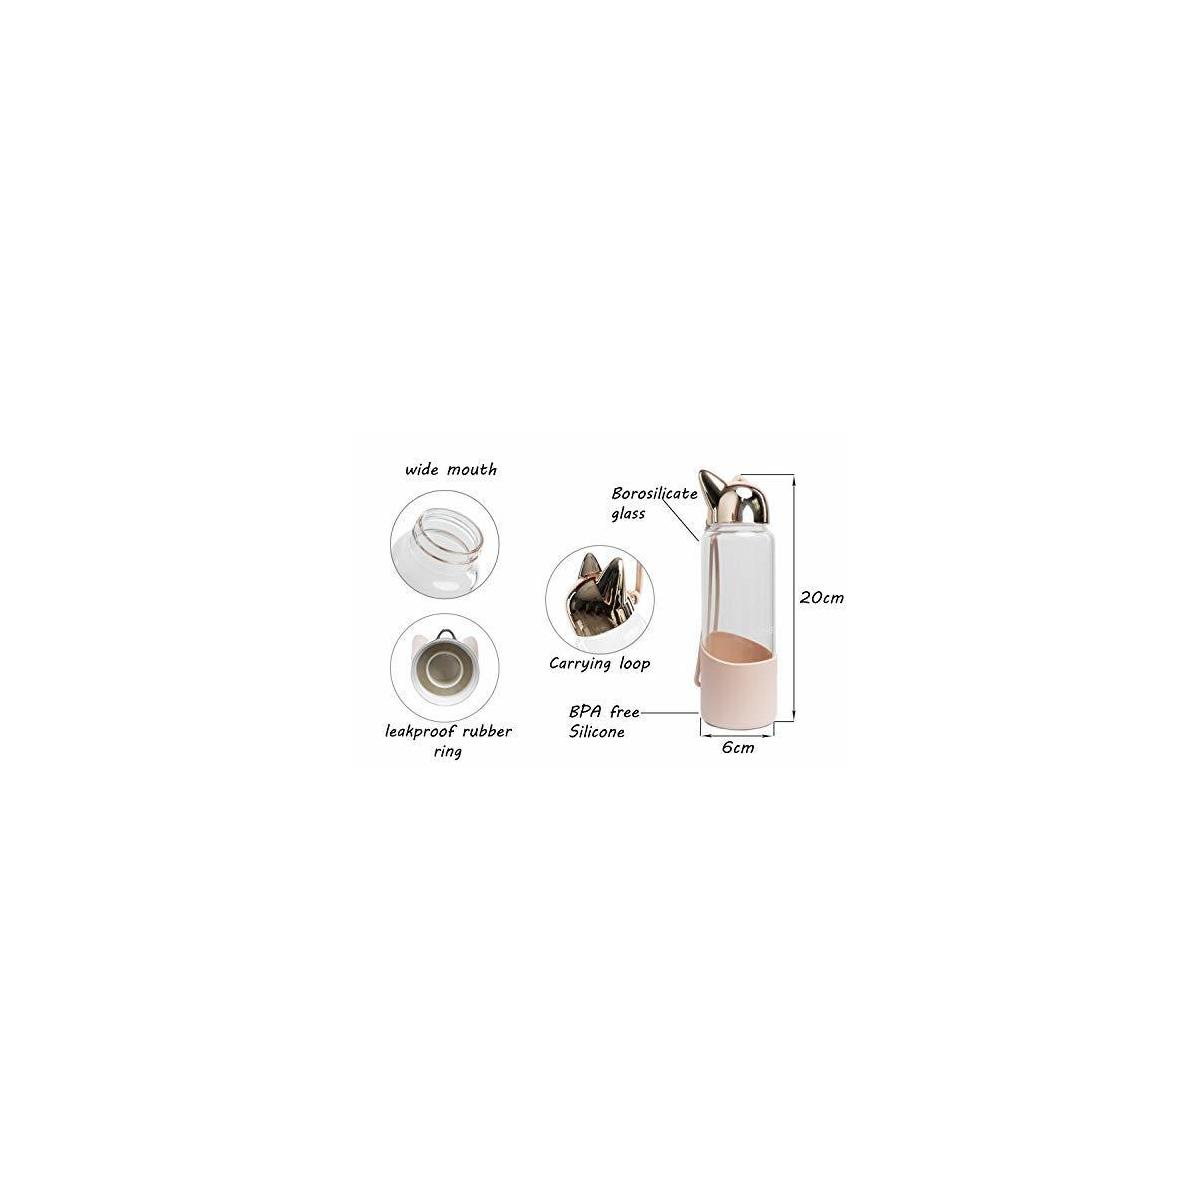 Nureen Glass Water Bottle Wide Mouth Design with Handle Peach Color & Bonus Recipe e-Book